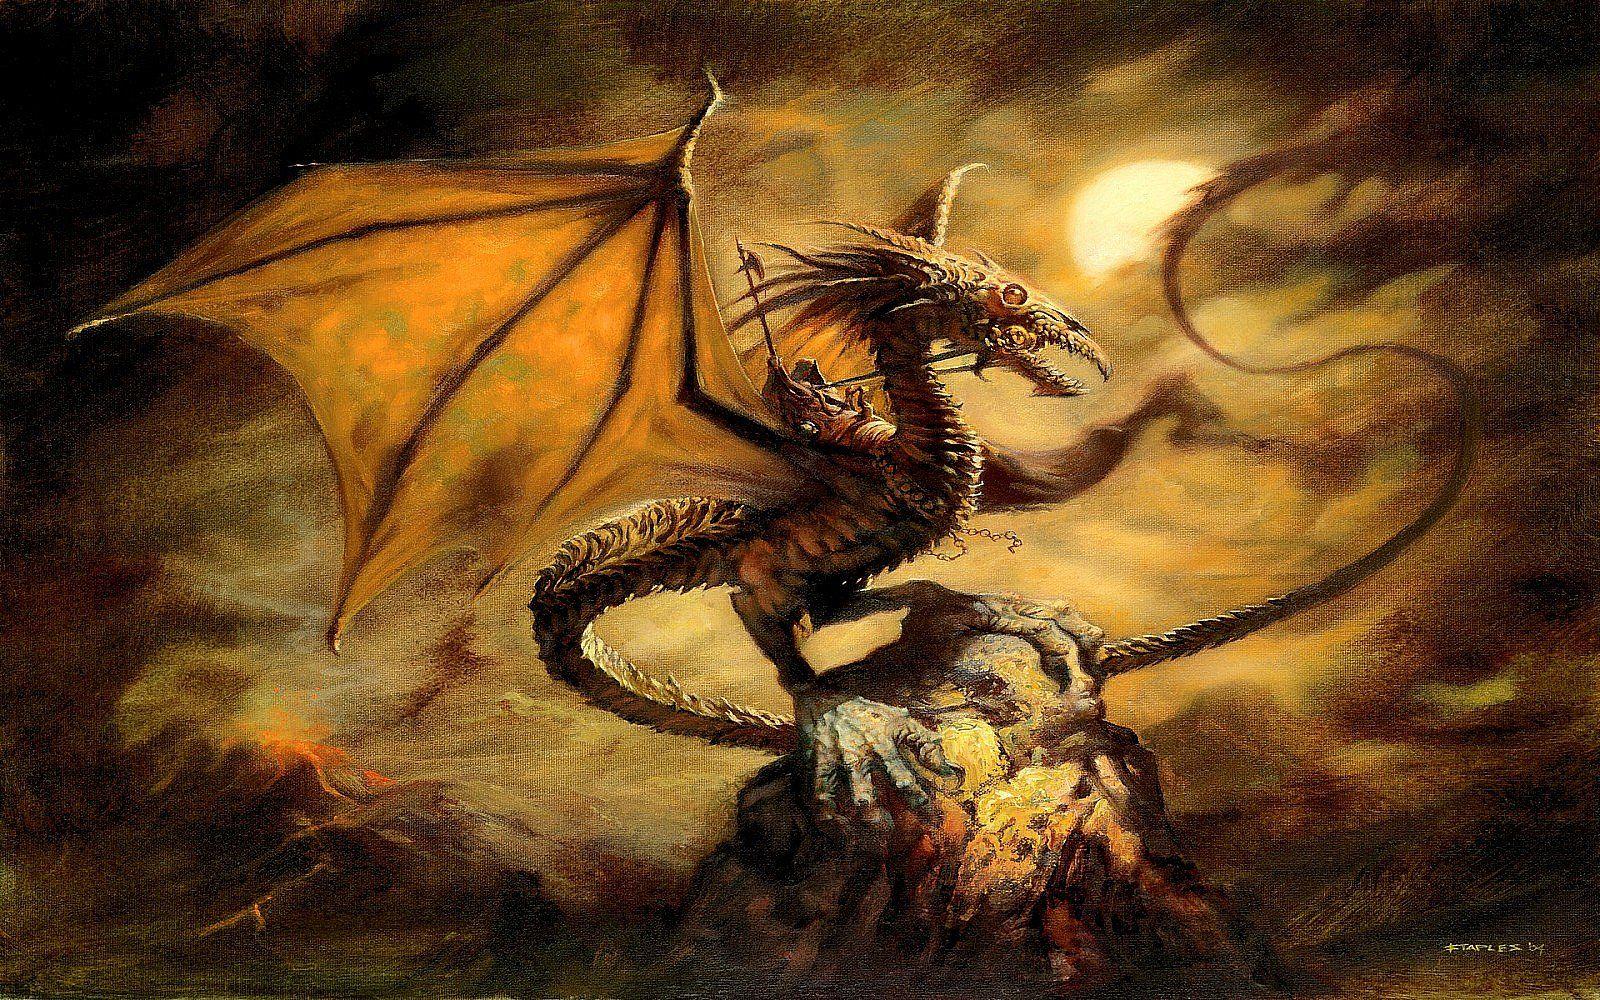 Dragon Screensavers And Wallpapers 1600x1000